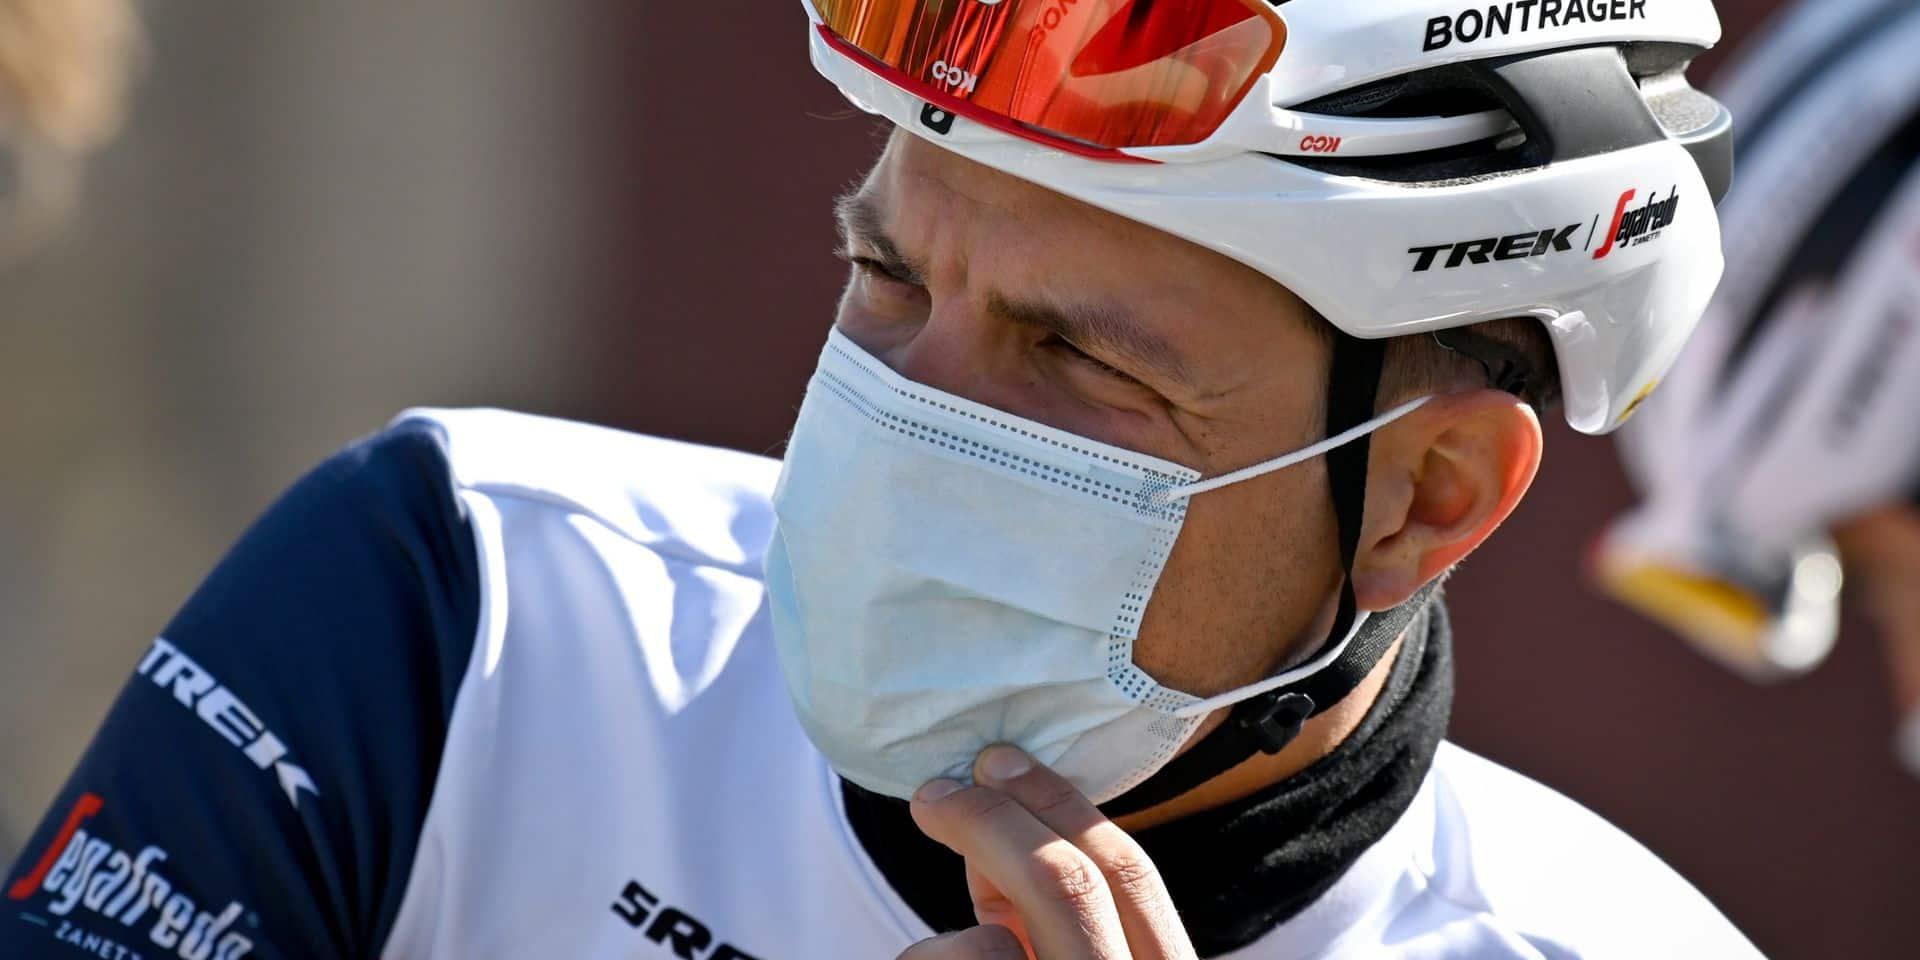 Milan-Sanremo : Jasper Stuyven et Vincenzo Nibali fers de lance de Trek-Segafredo